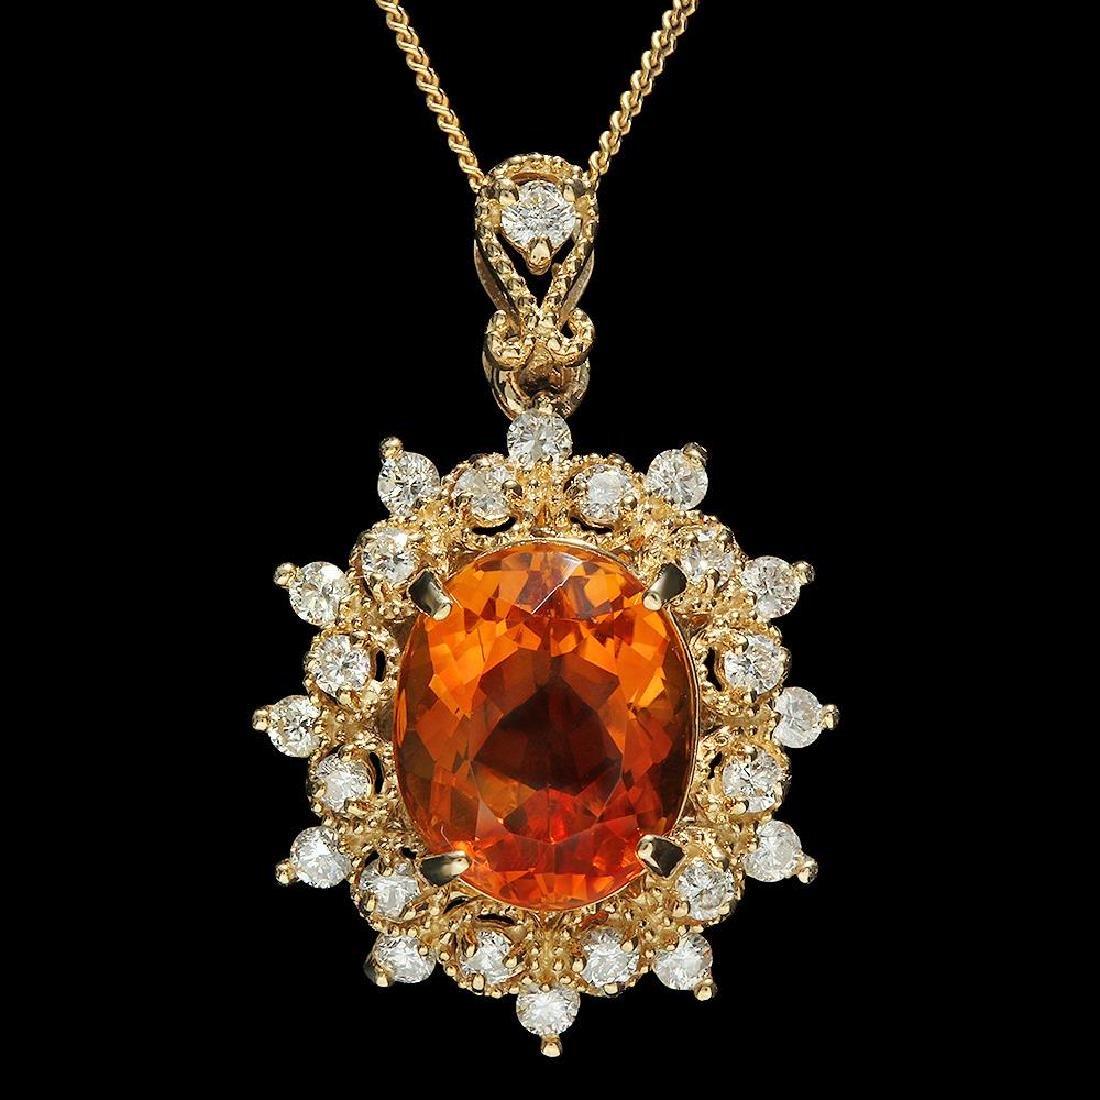 14K Gold 4.03ct Citrine 0.70ct Diamond Pendant